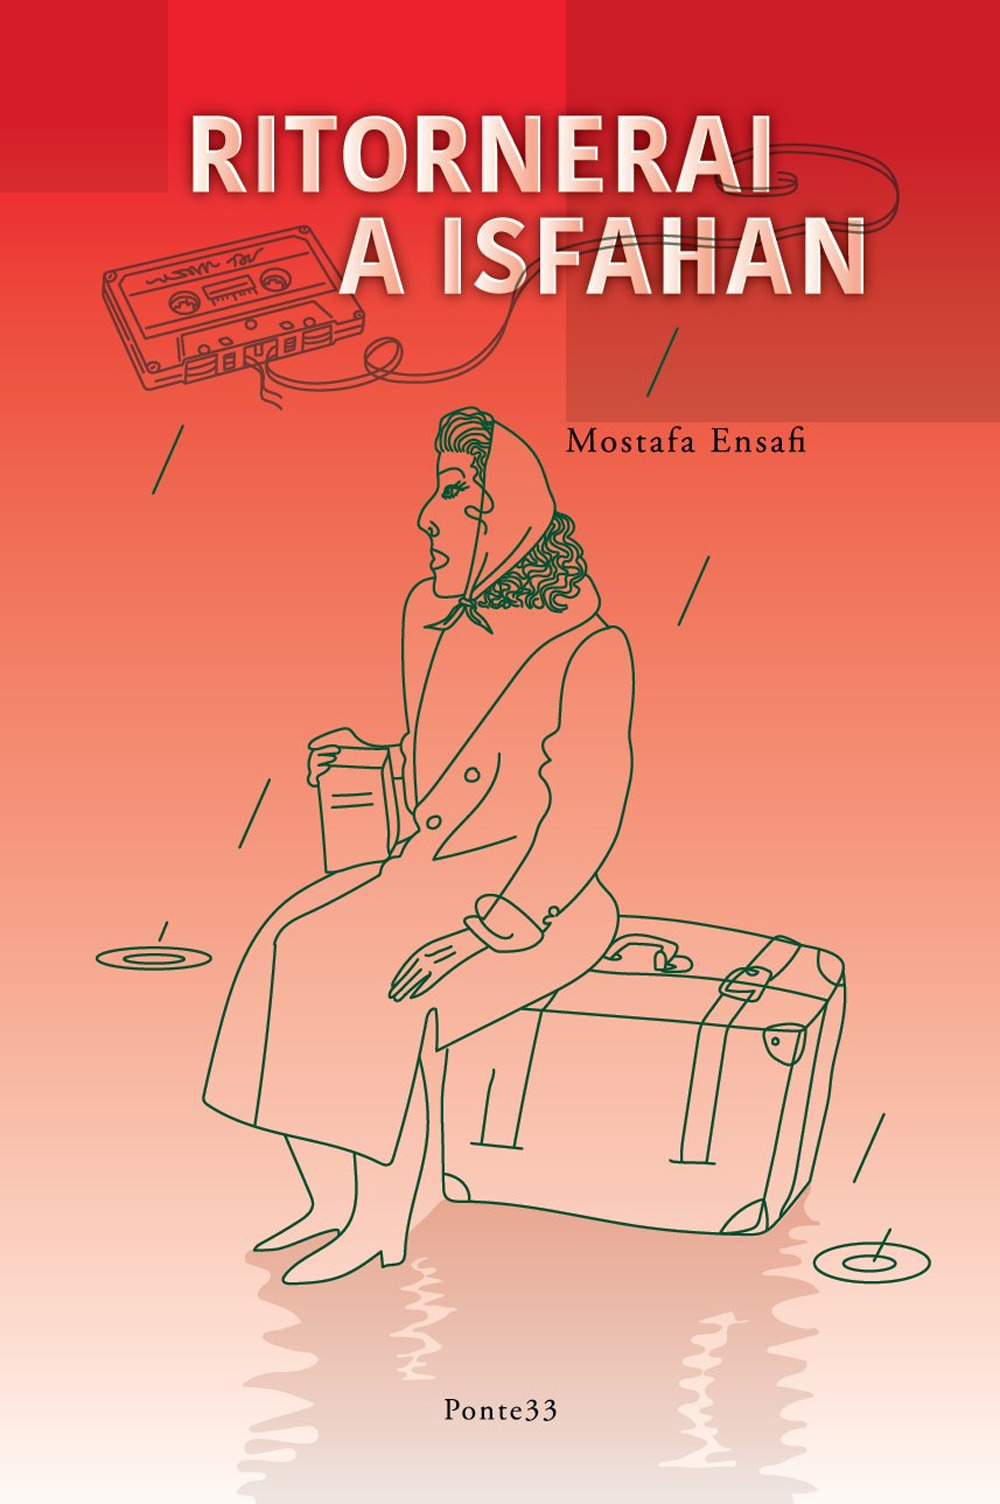 Ritornerai a Isfahan